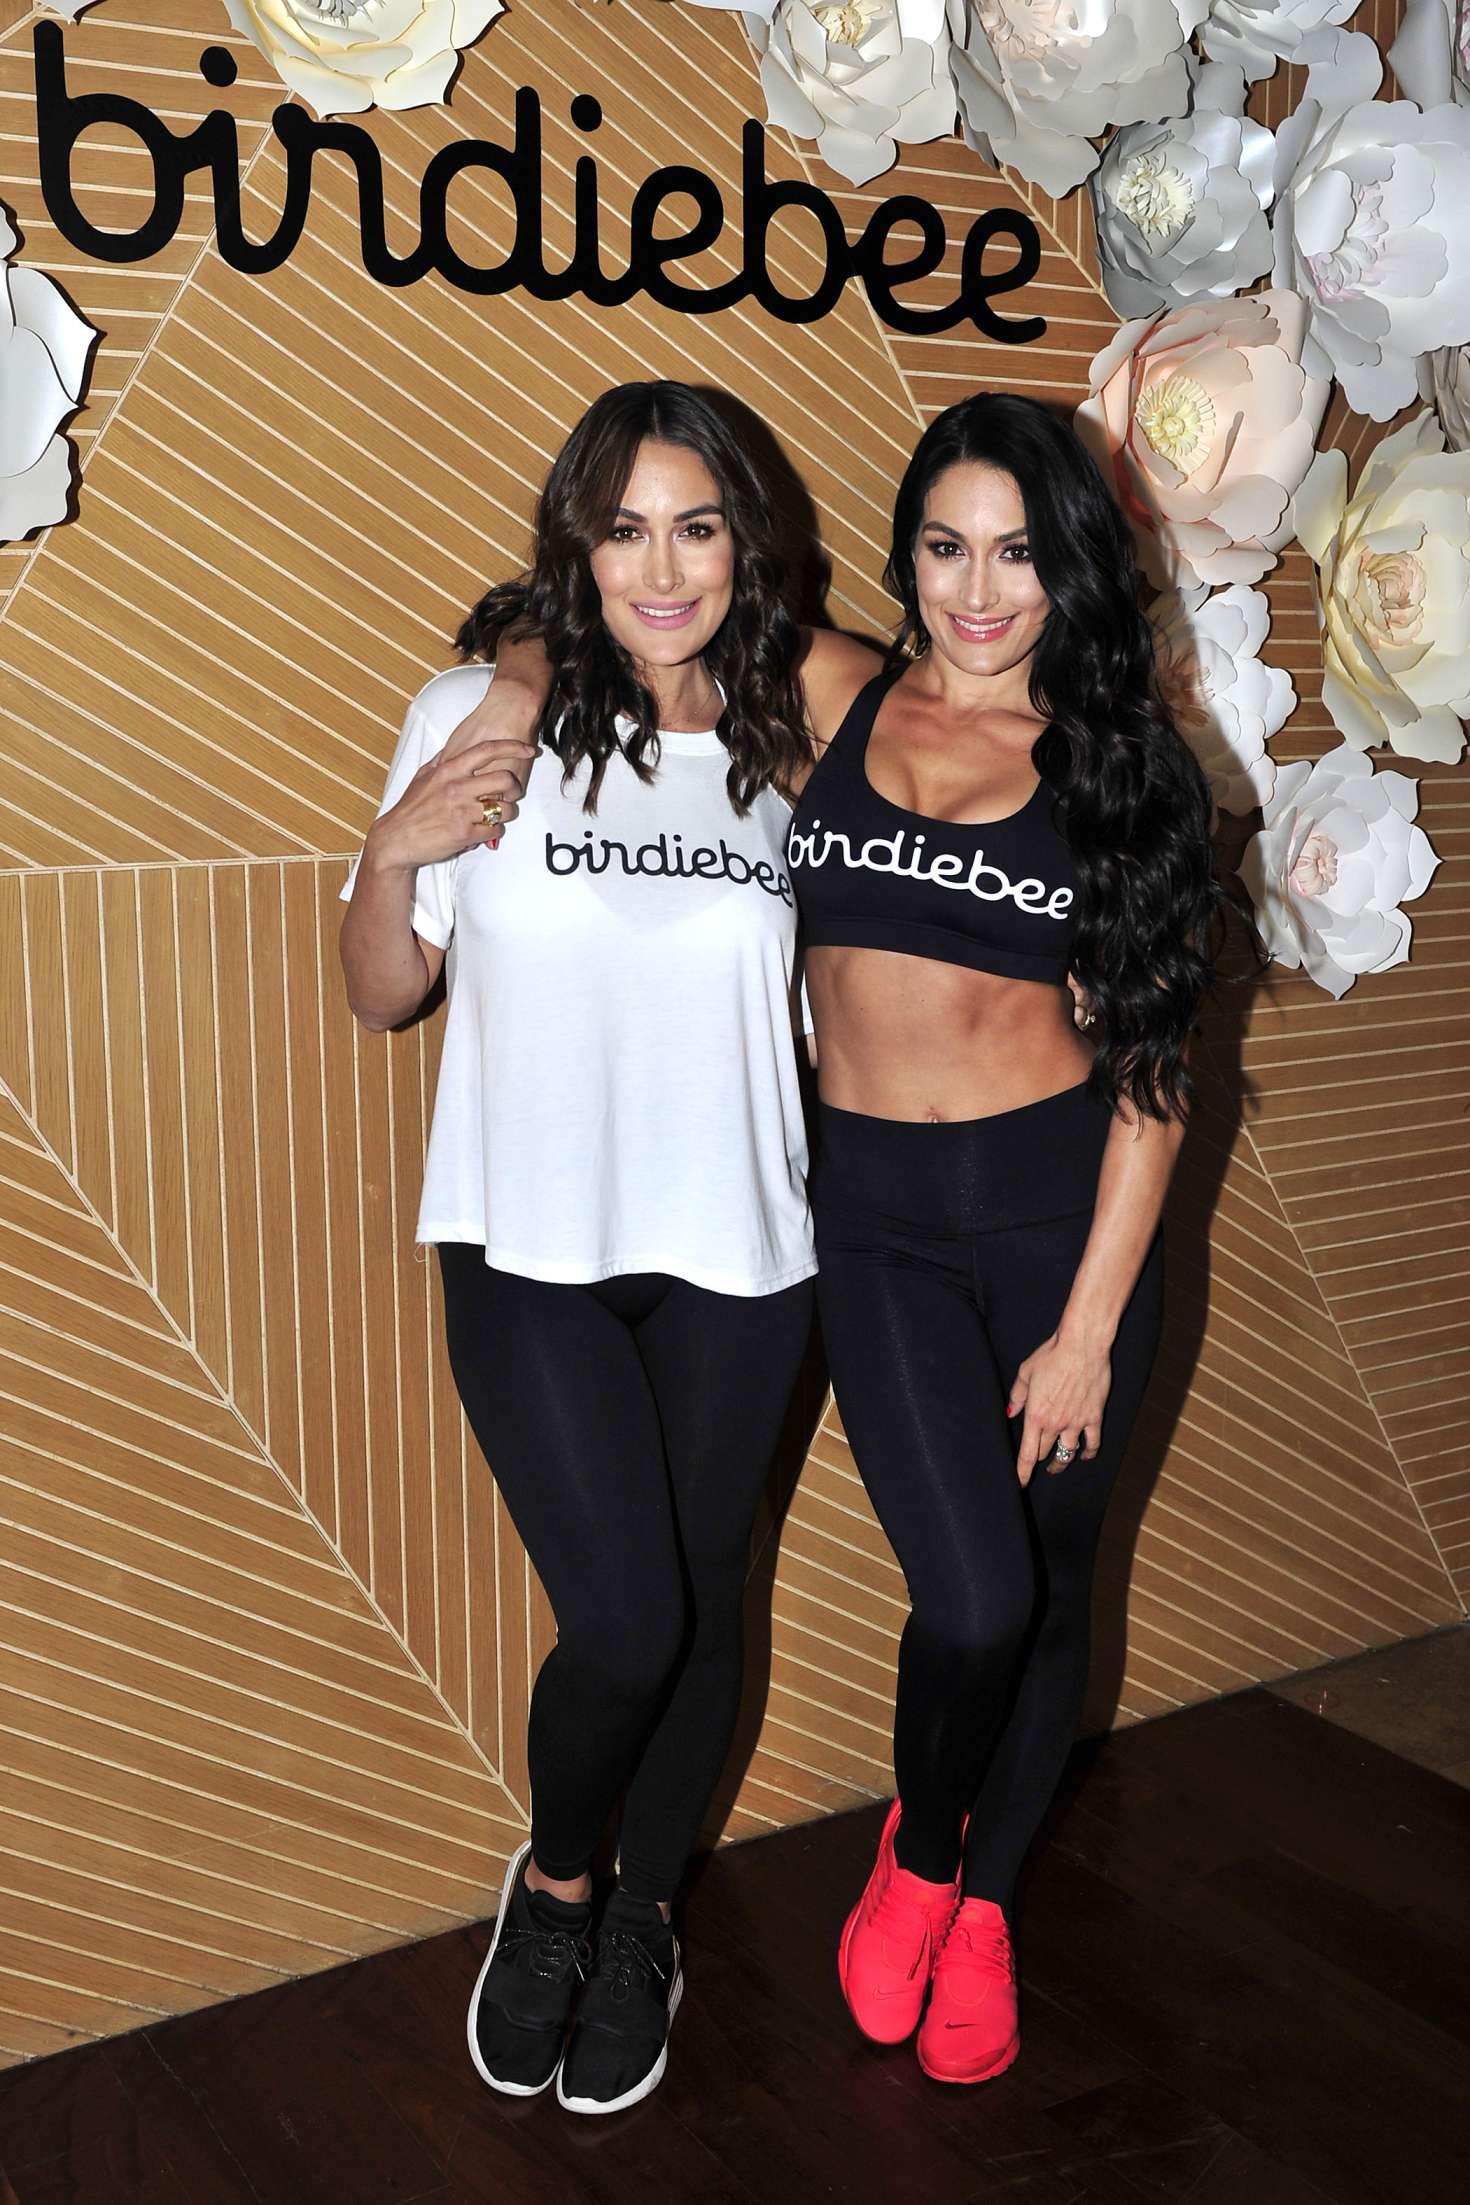 Brie Bella 2017 : Brie and Nikki Bella: Birdiebee brand of clothing launch -03